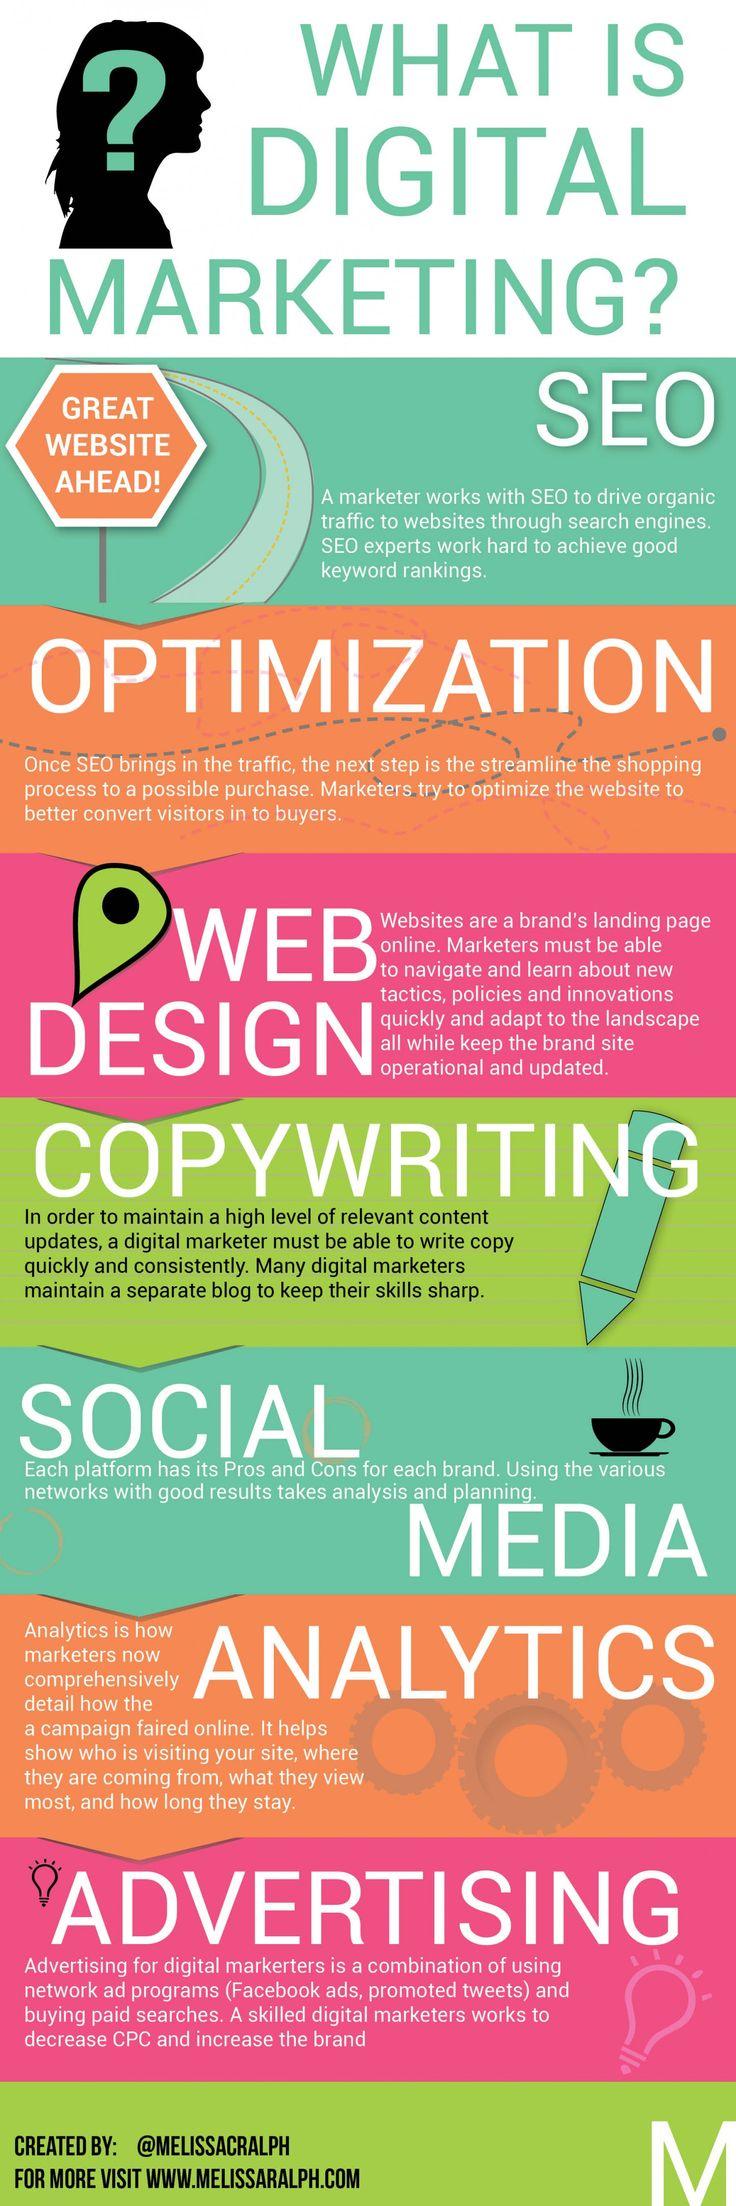 What is Digital Marketing? It´s: SEO, Optimizing, Web Design, Copywriting, Social Media, Analytics  Advertising  #infographic